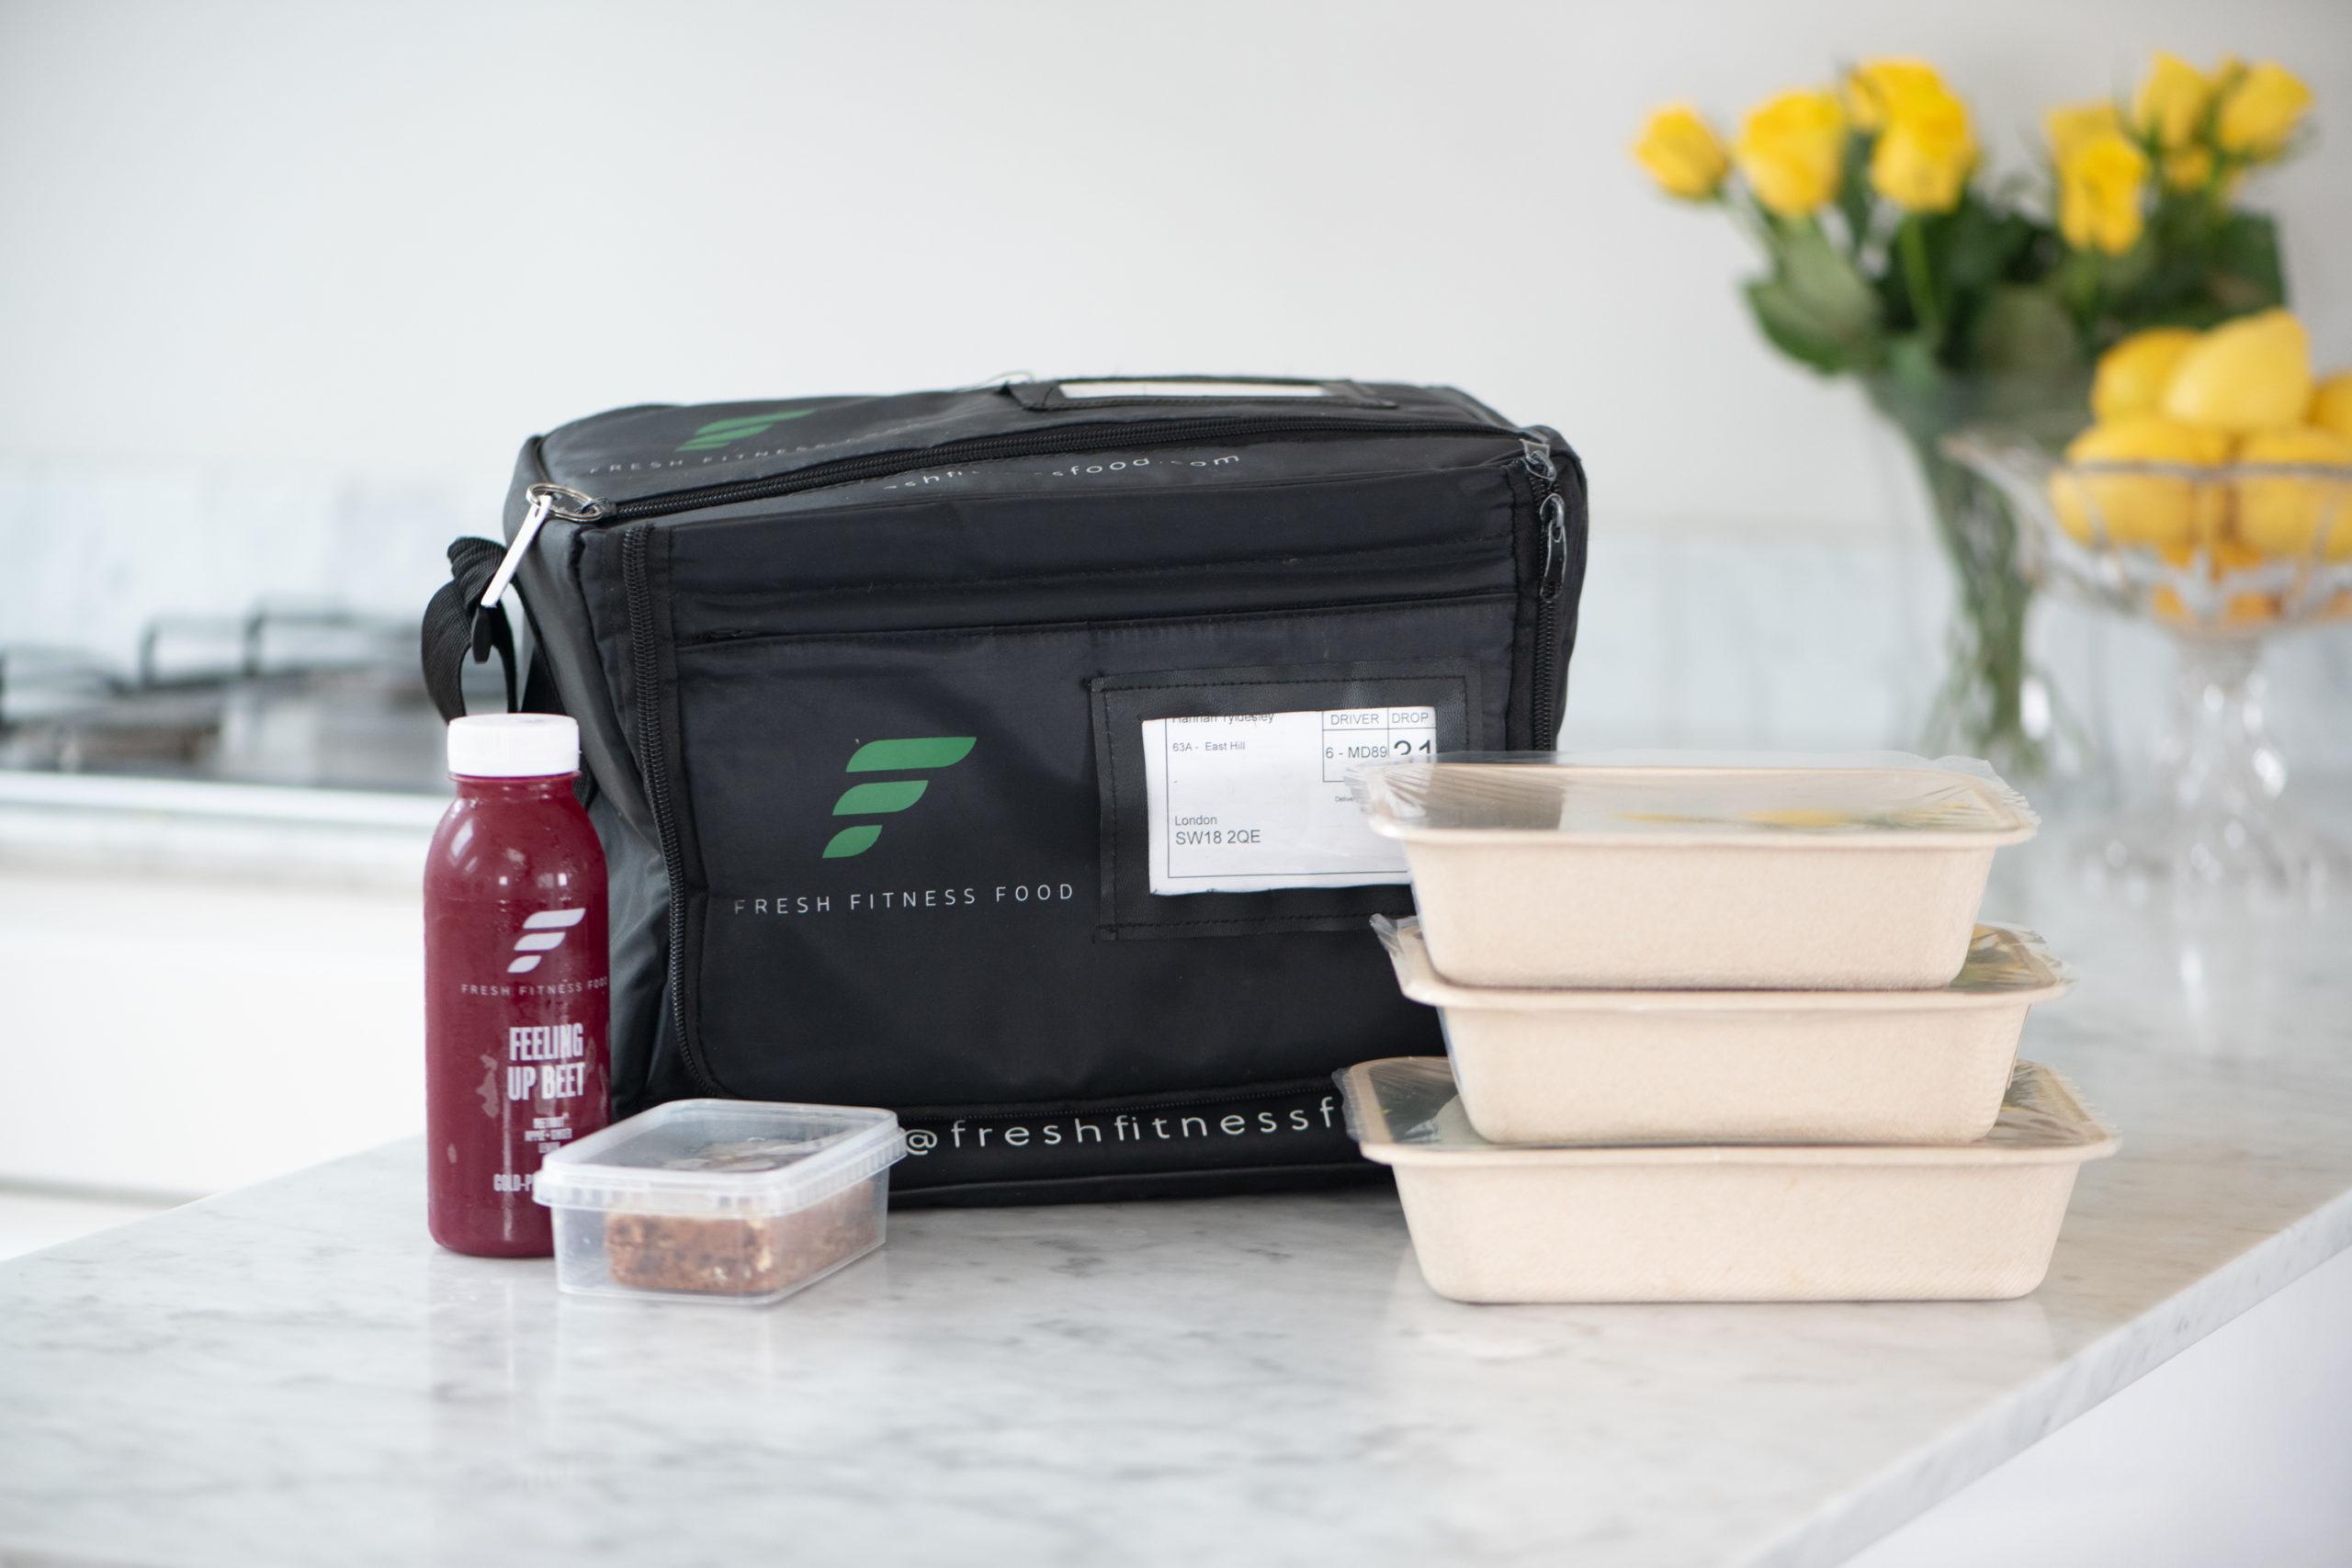 Fresh Fitness Food Bag and Food easy meal plan